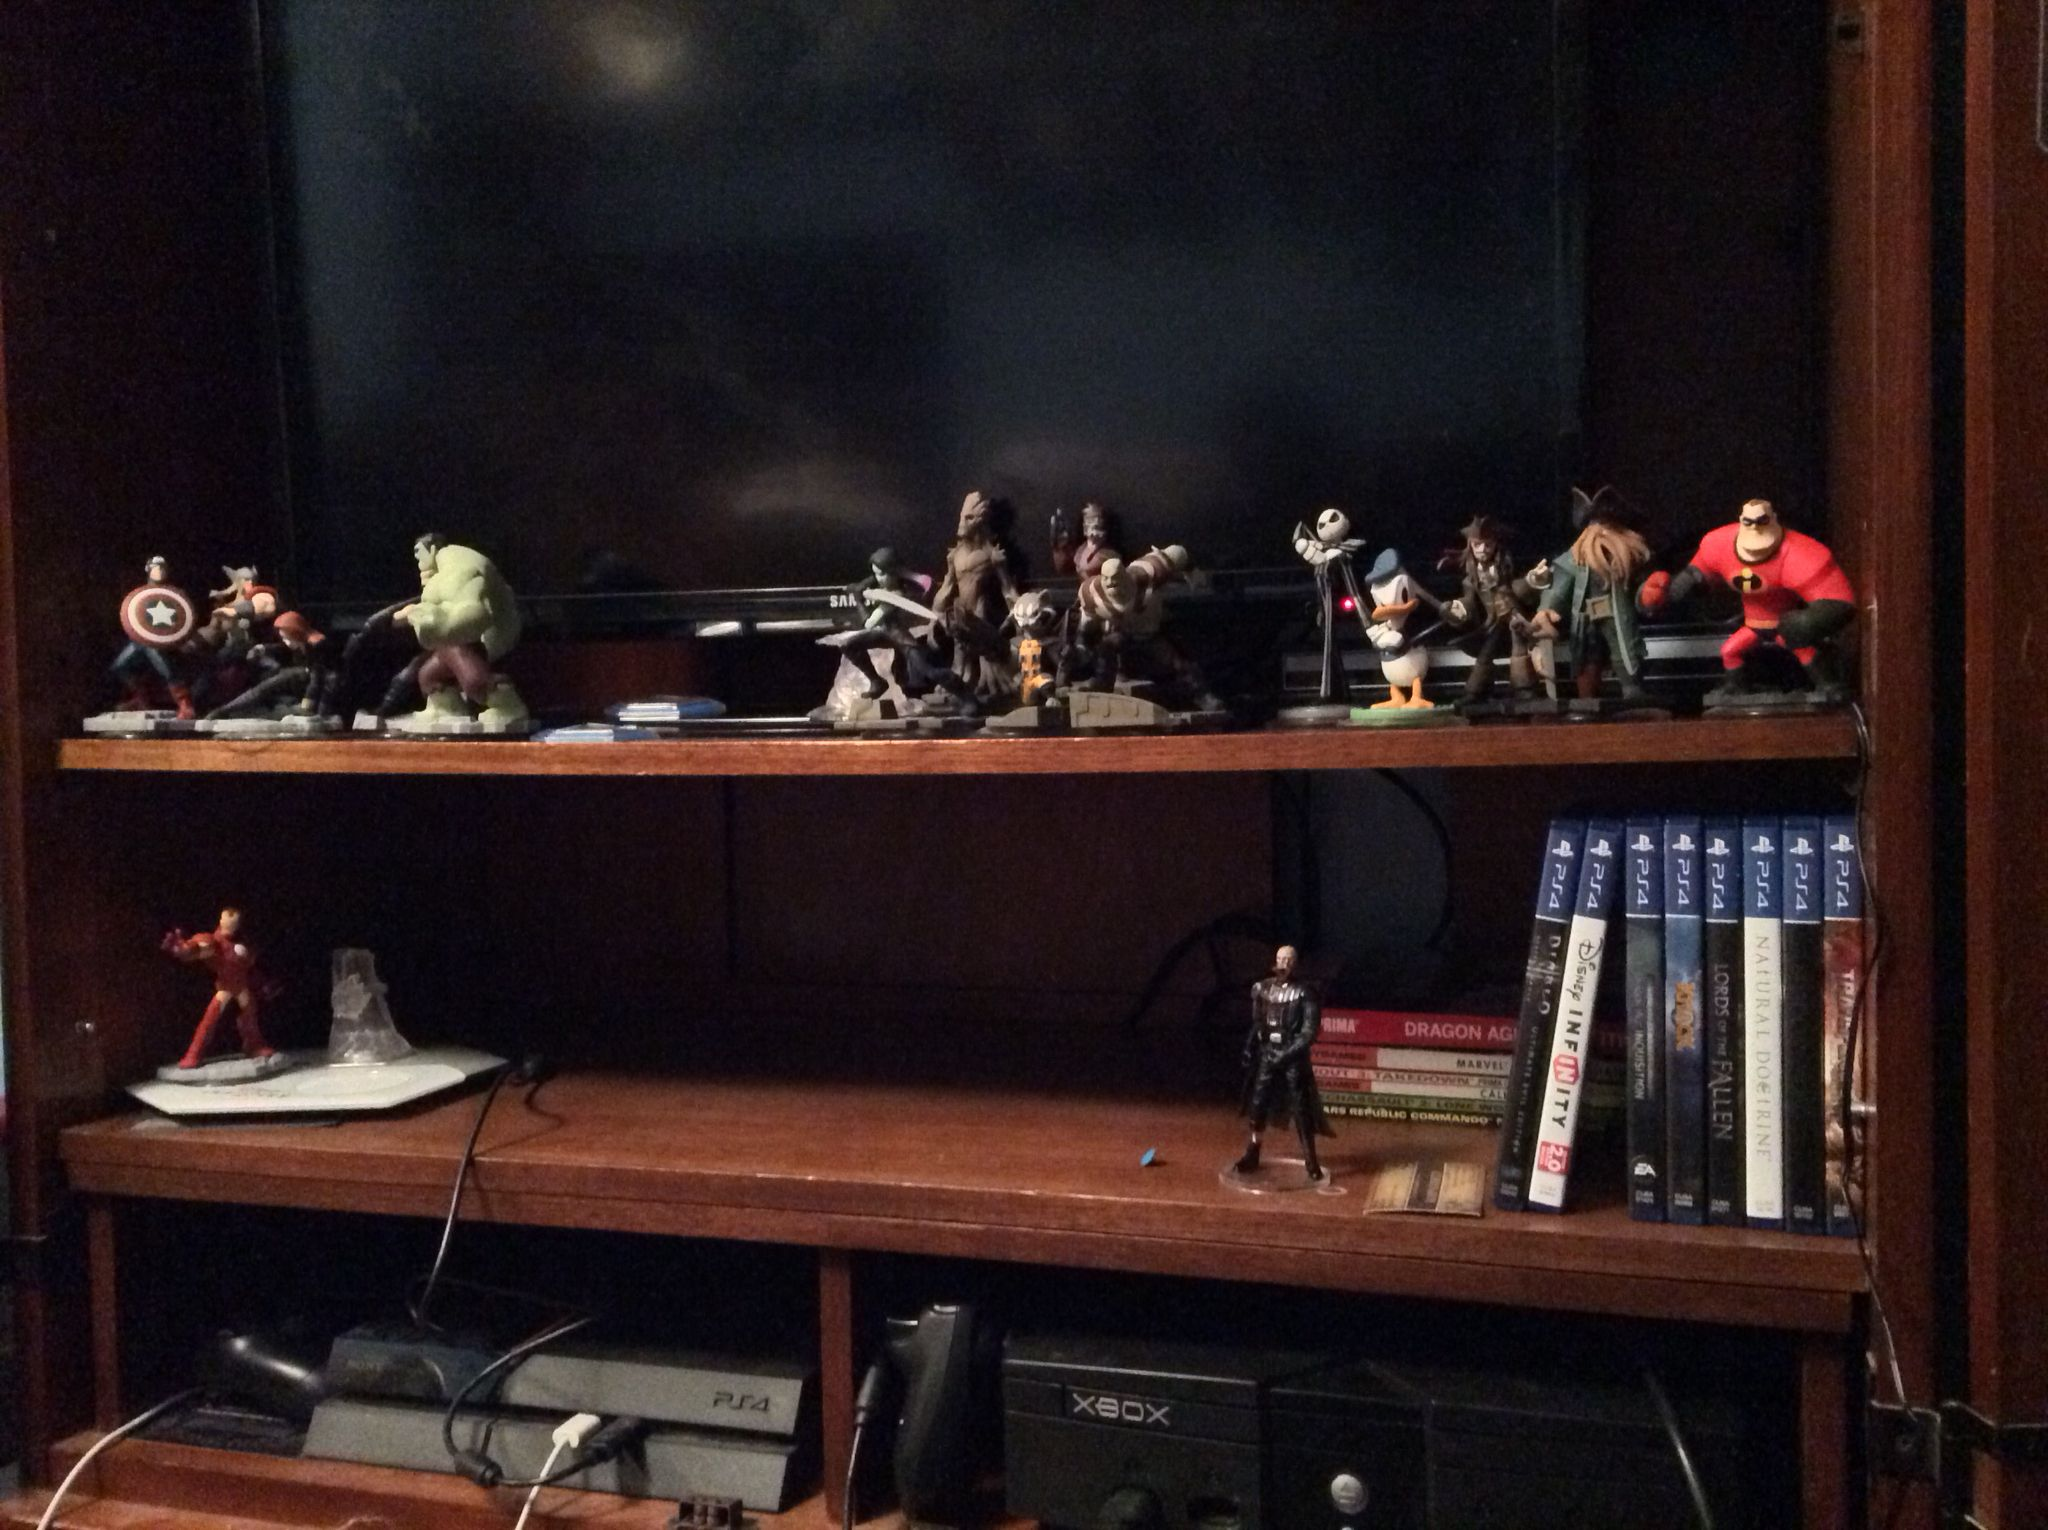 Intermediate gaming setup with Disney Infinity 2 0 figures